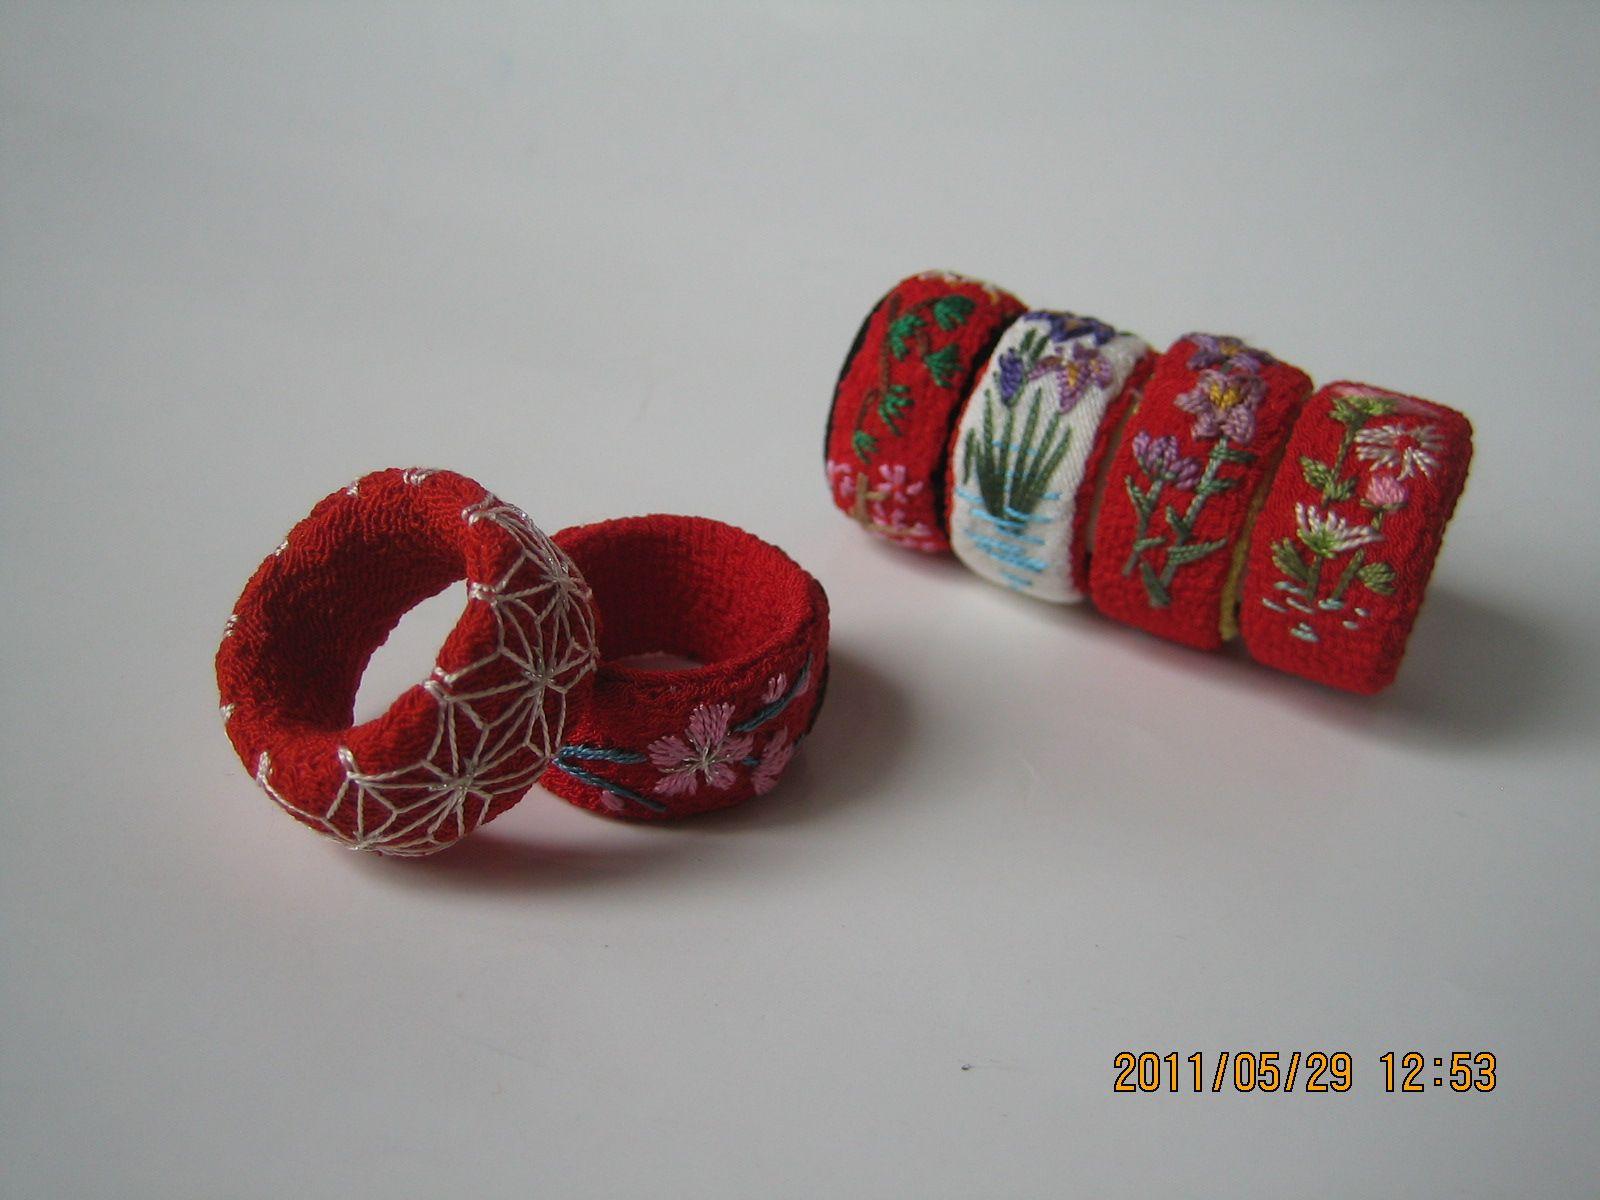 Yubinuki thimble rings with tiny embroidery work